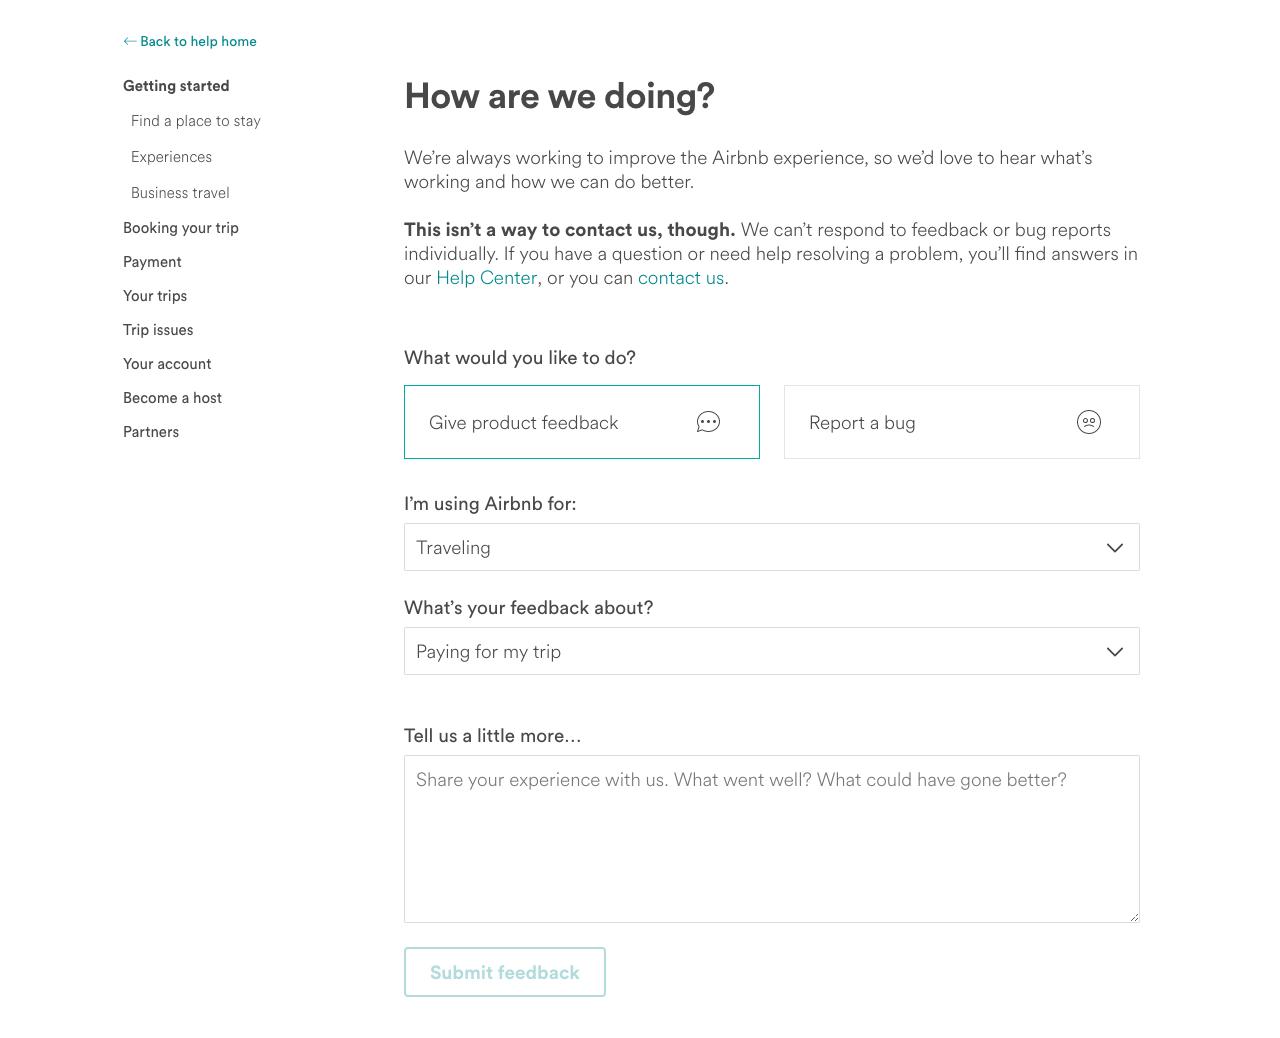 Airbnb feedback questionnaire